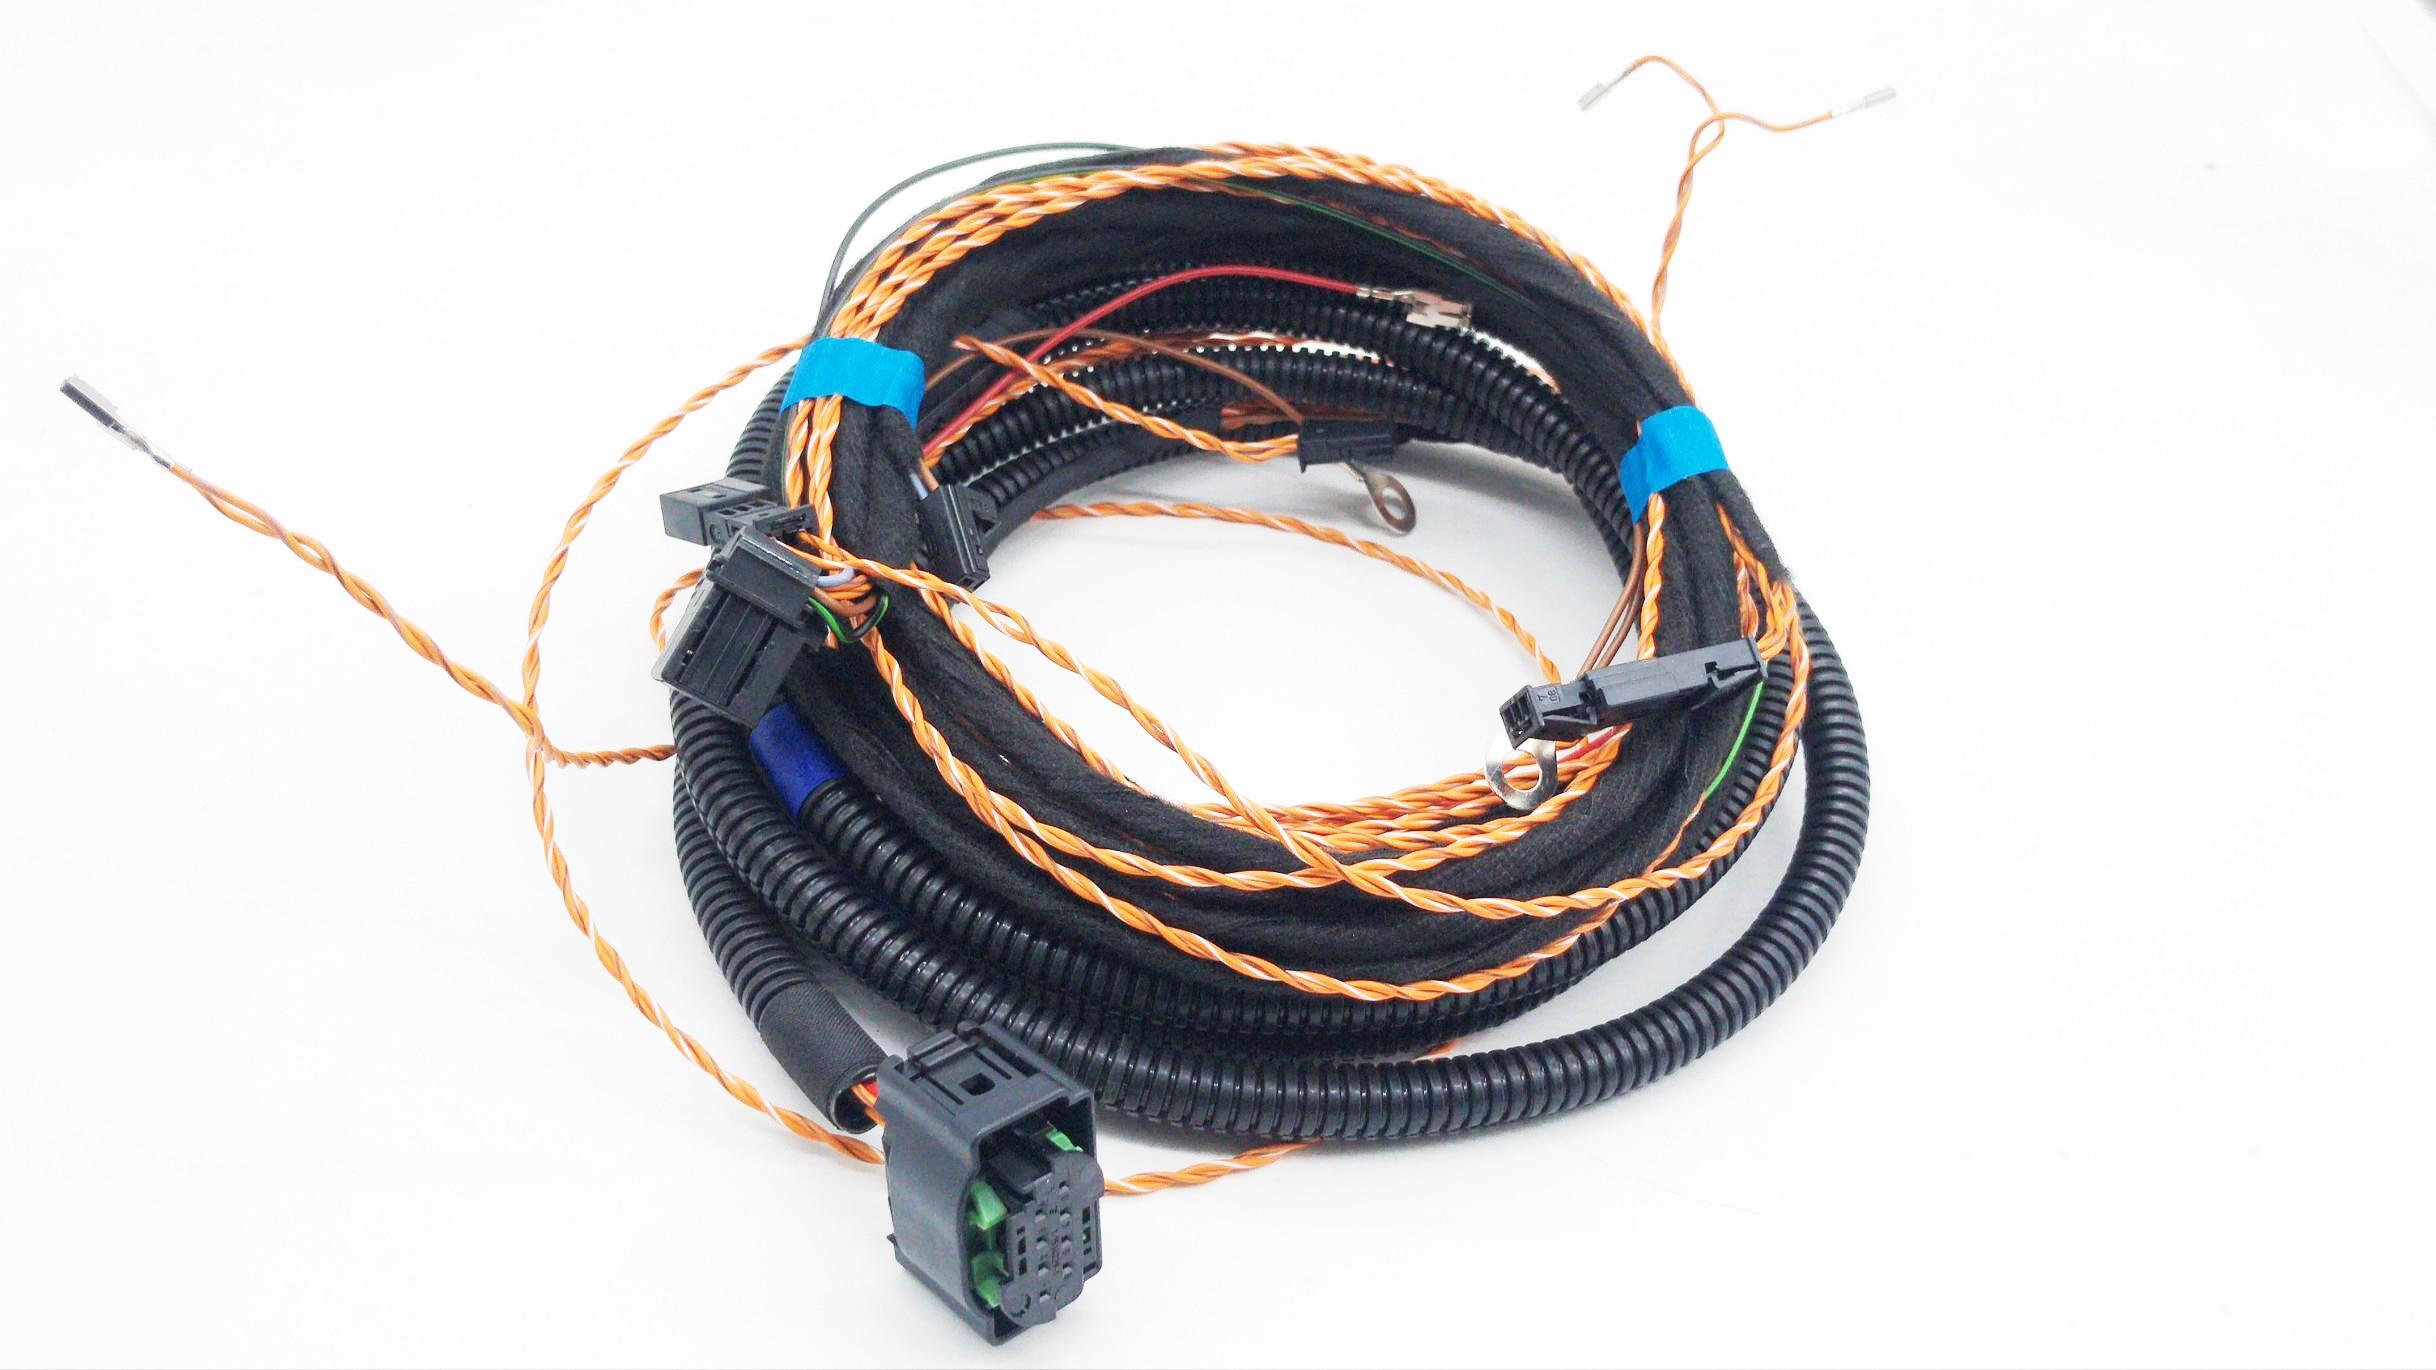 Sistema de mantenimiento de cambio de carril asistente de carril ACC adaptable cable de crucero arnés cámara frontal uso para Audi MQB para VW Golf 7 MK7